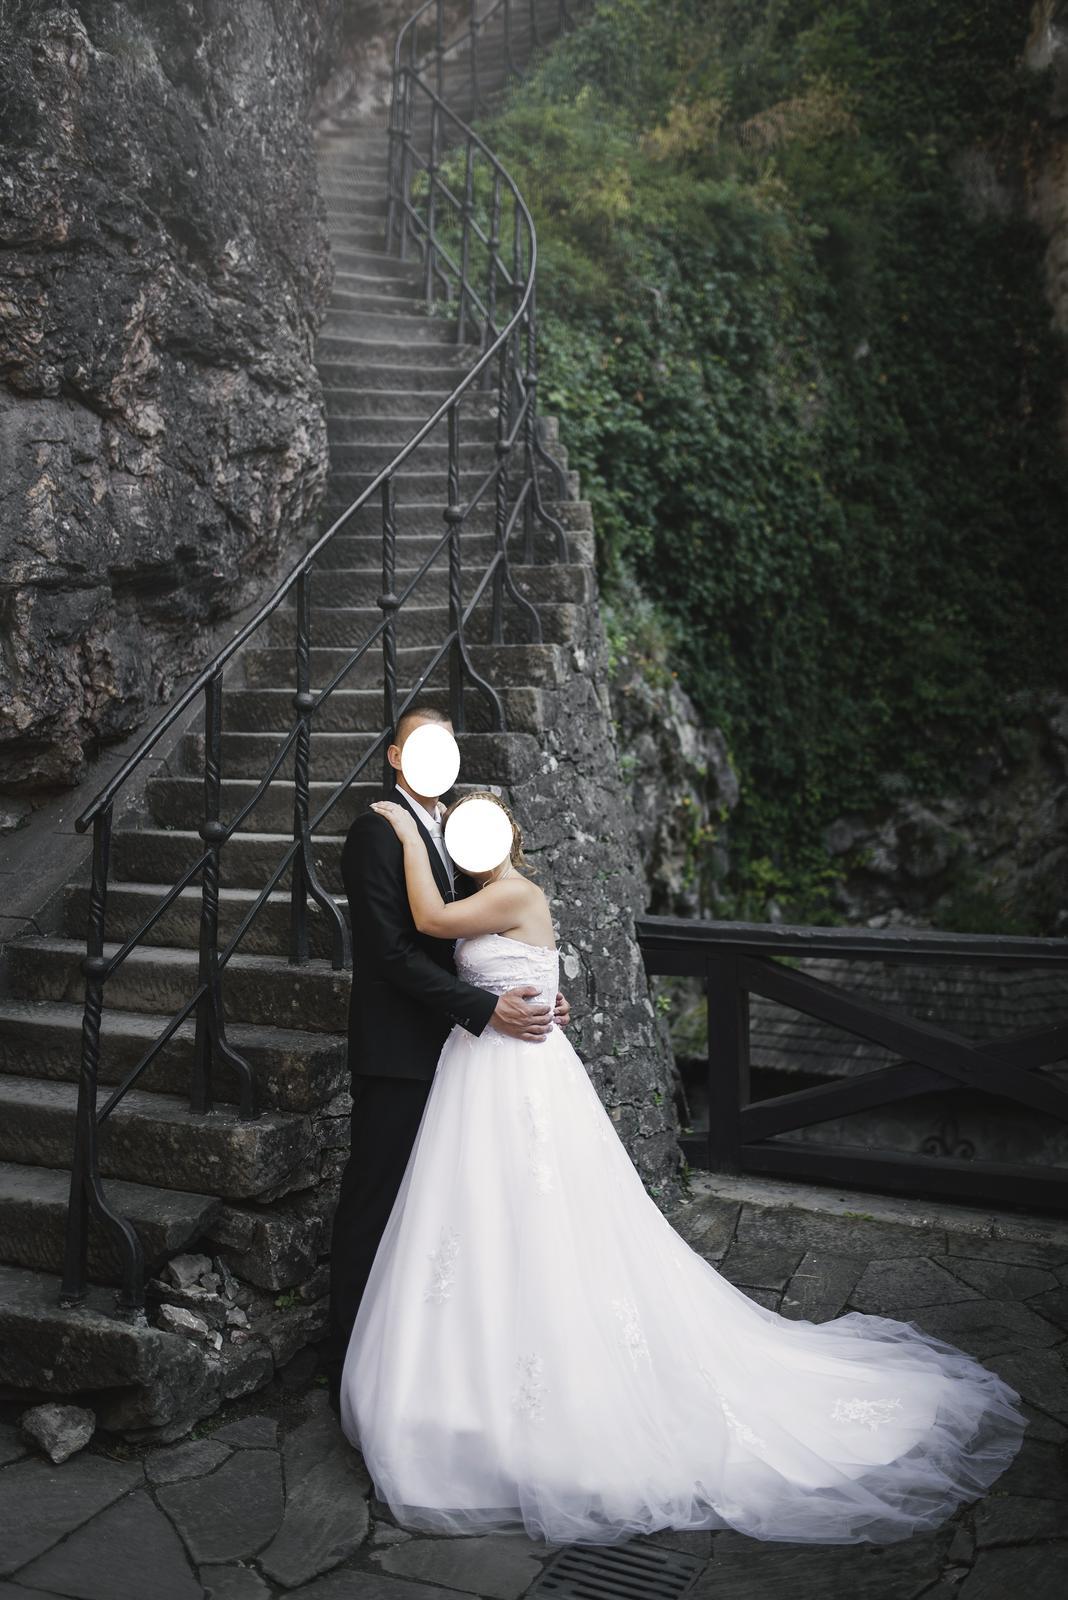 svadobne saty - Obrázok č. 1